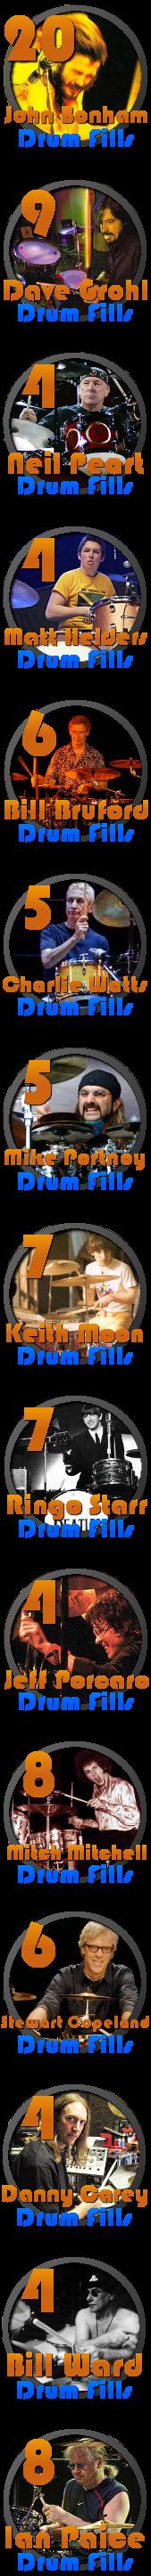 Famous & Popular Drummers & Fills